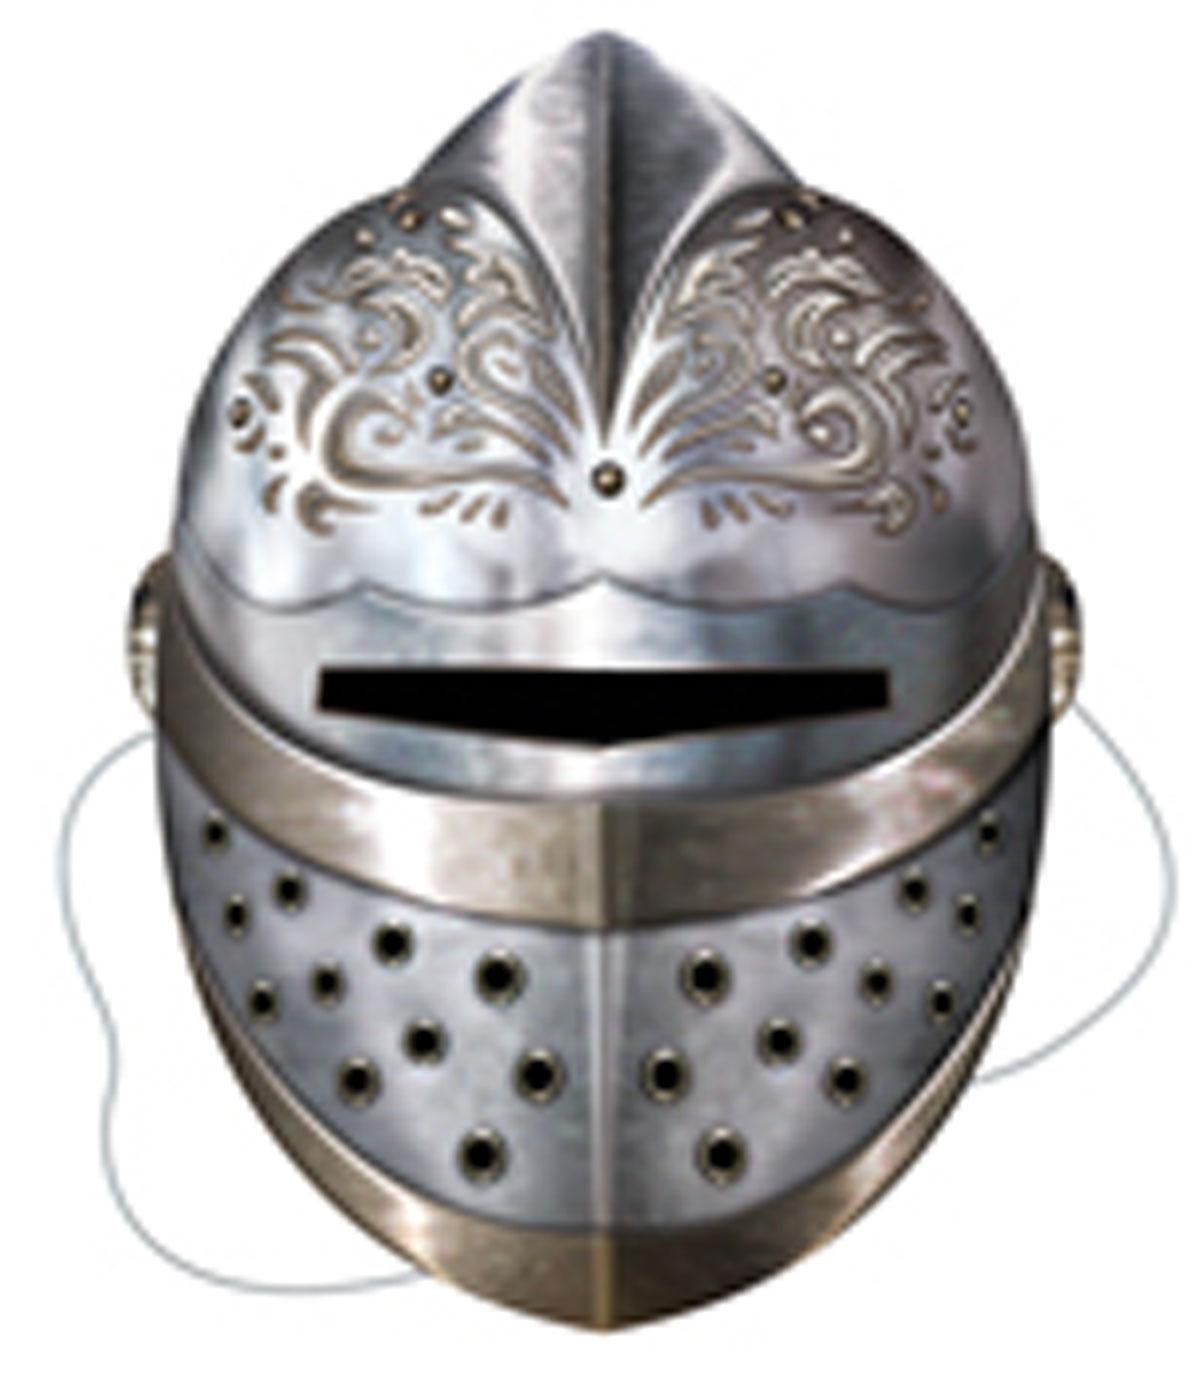 John Rozum.com: 31 Days of Halloween - Day 12 - Mask of the Day